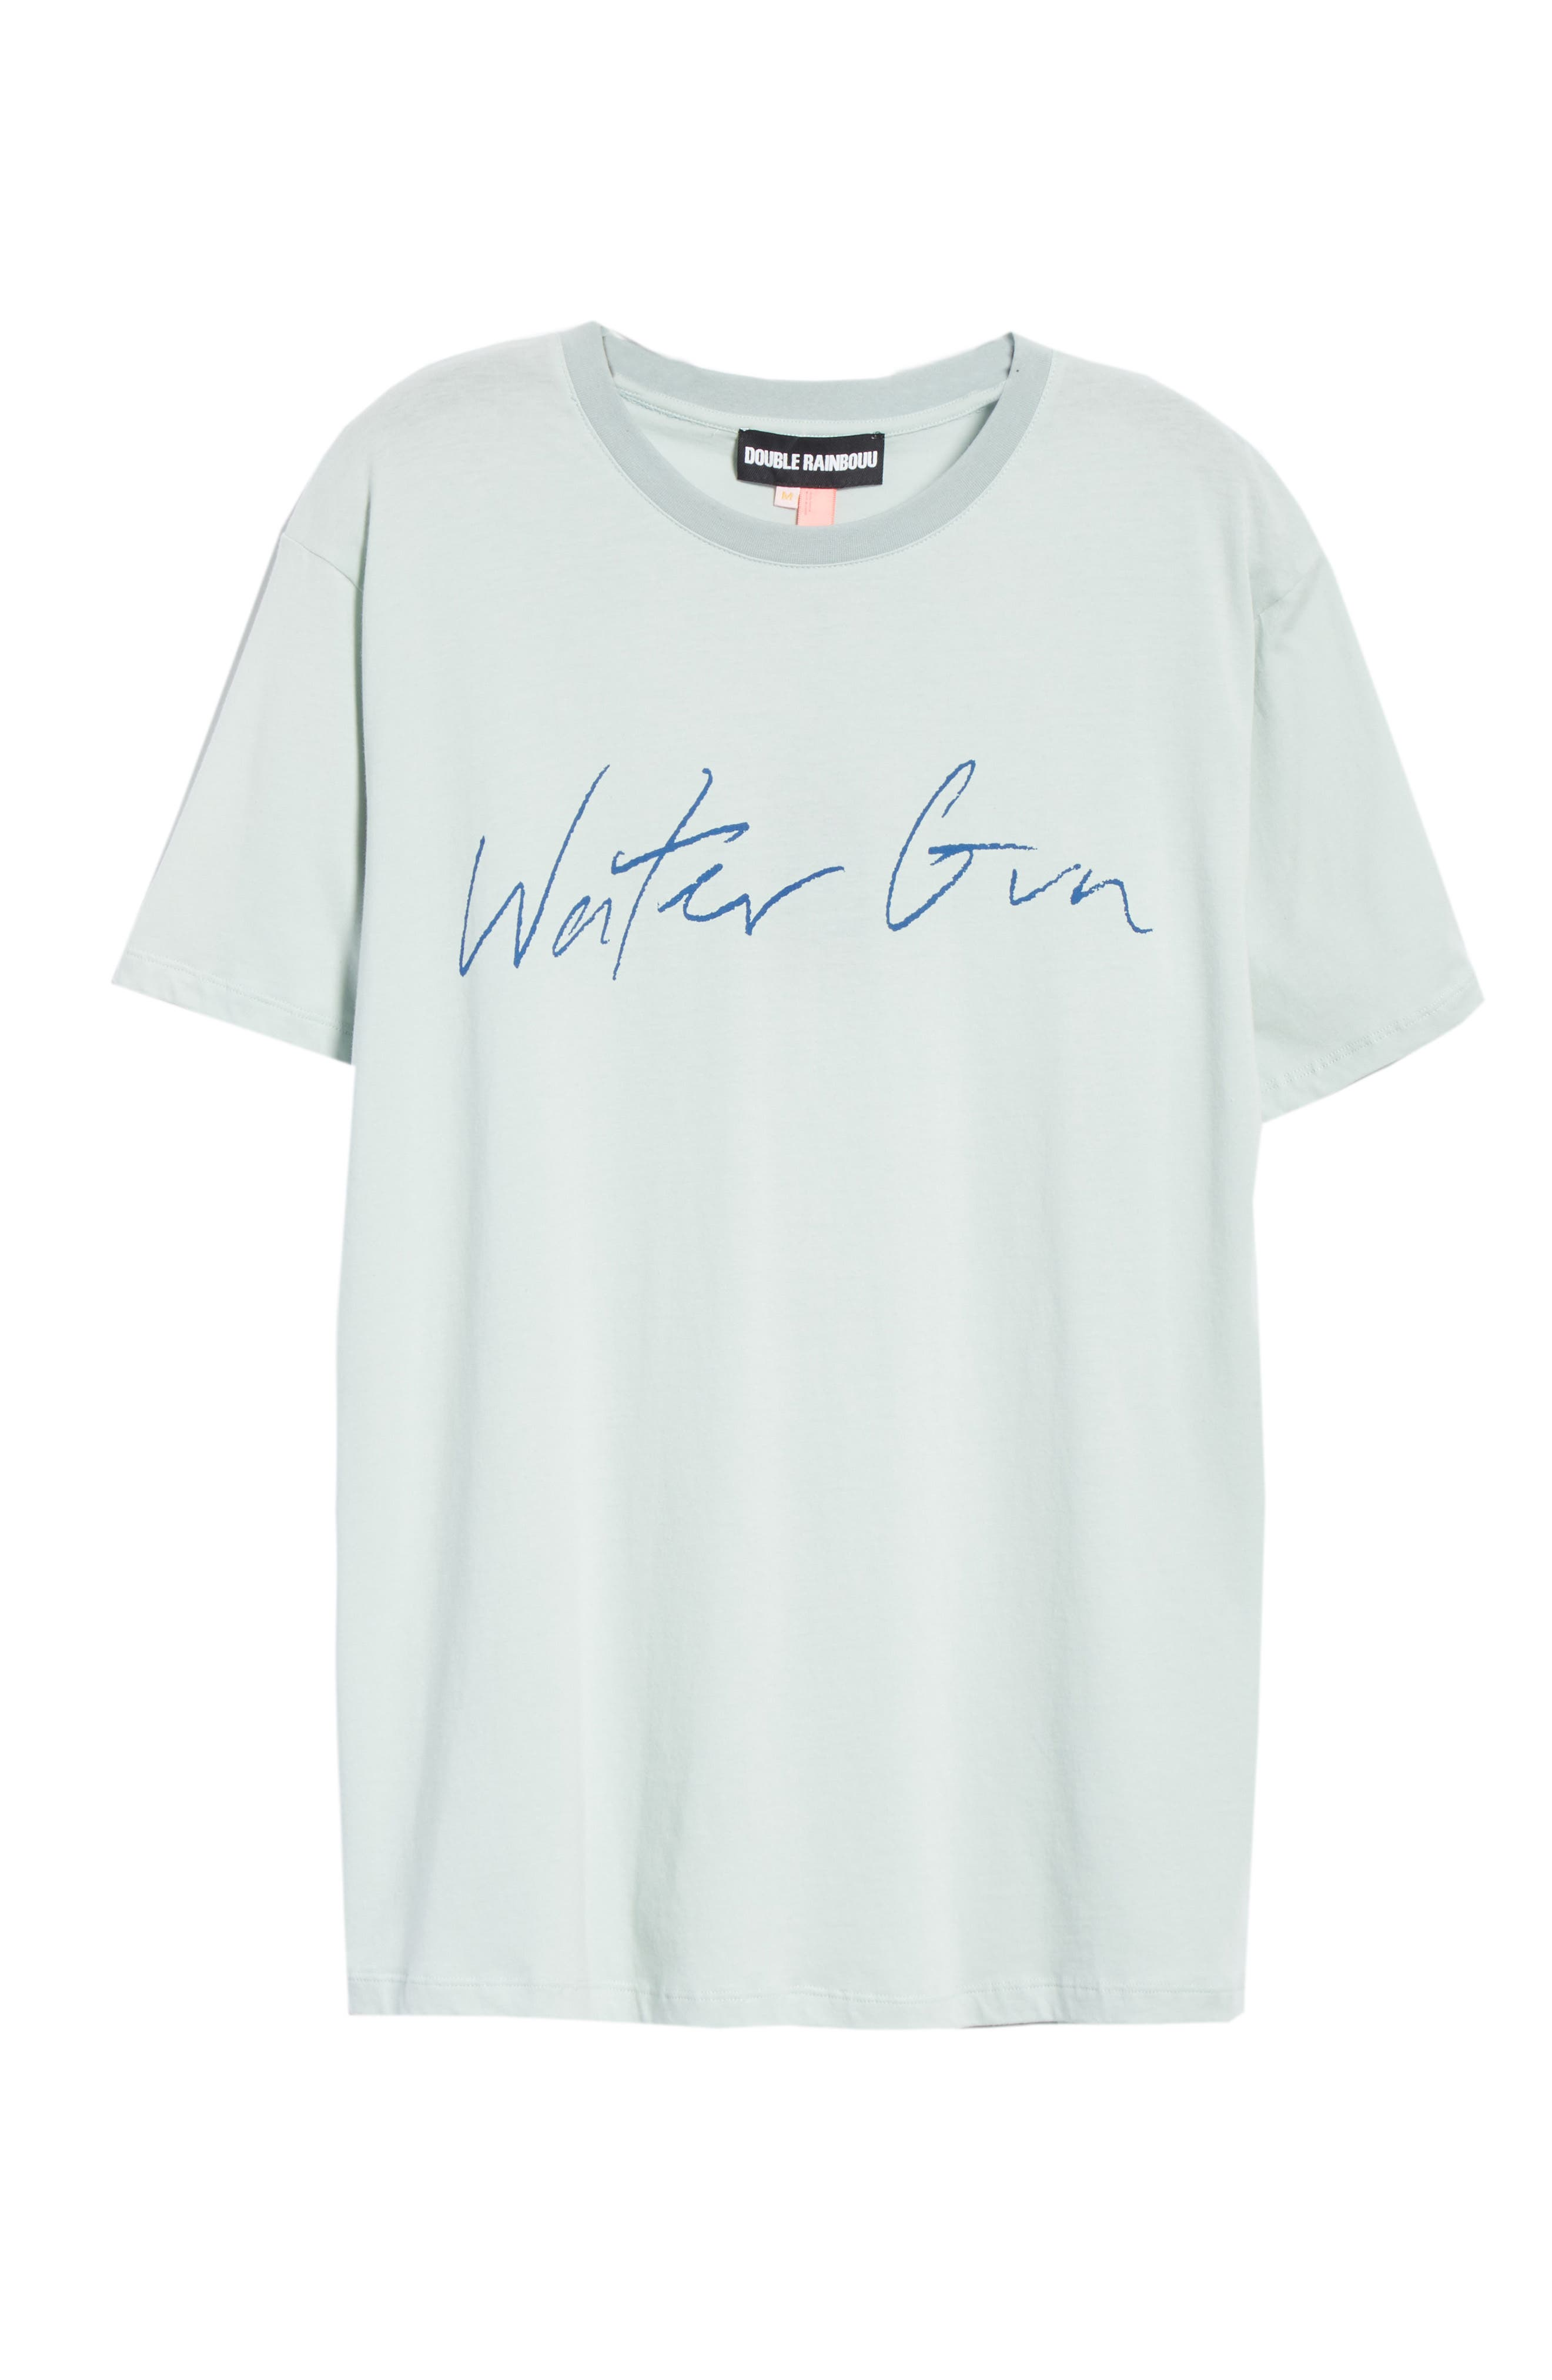 Water Gun Graphic T-Shirt,                             Alternate thumbnail 6, color,                             BLUE